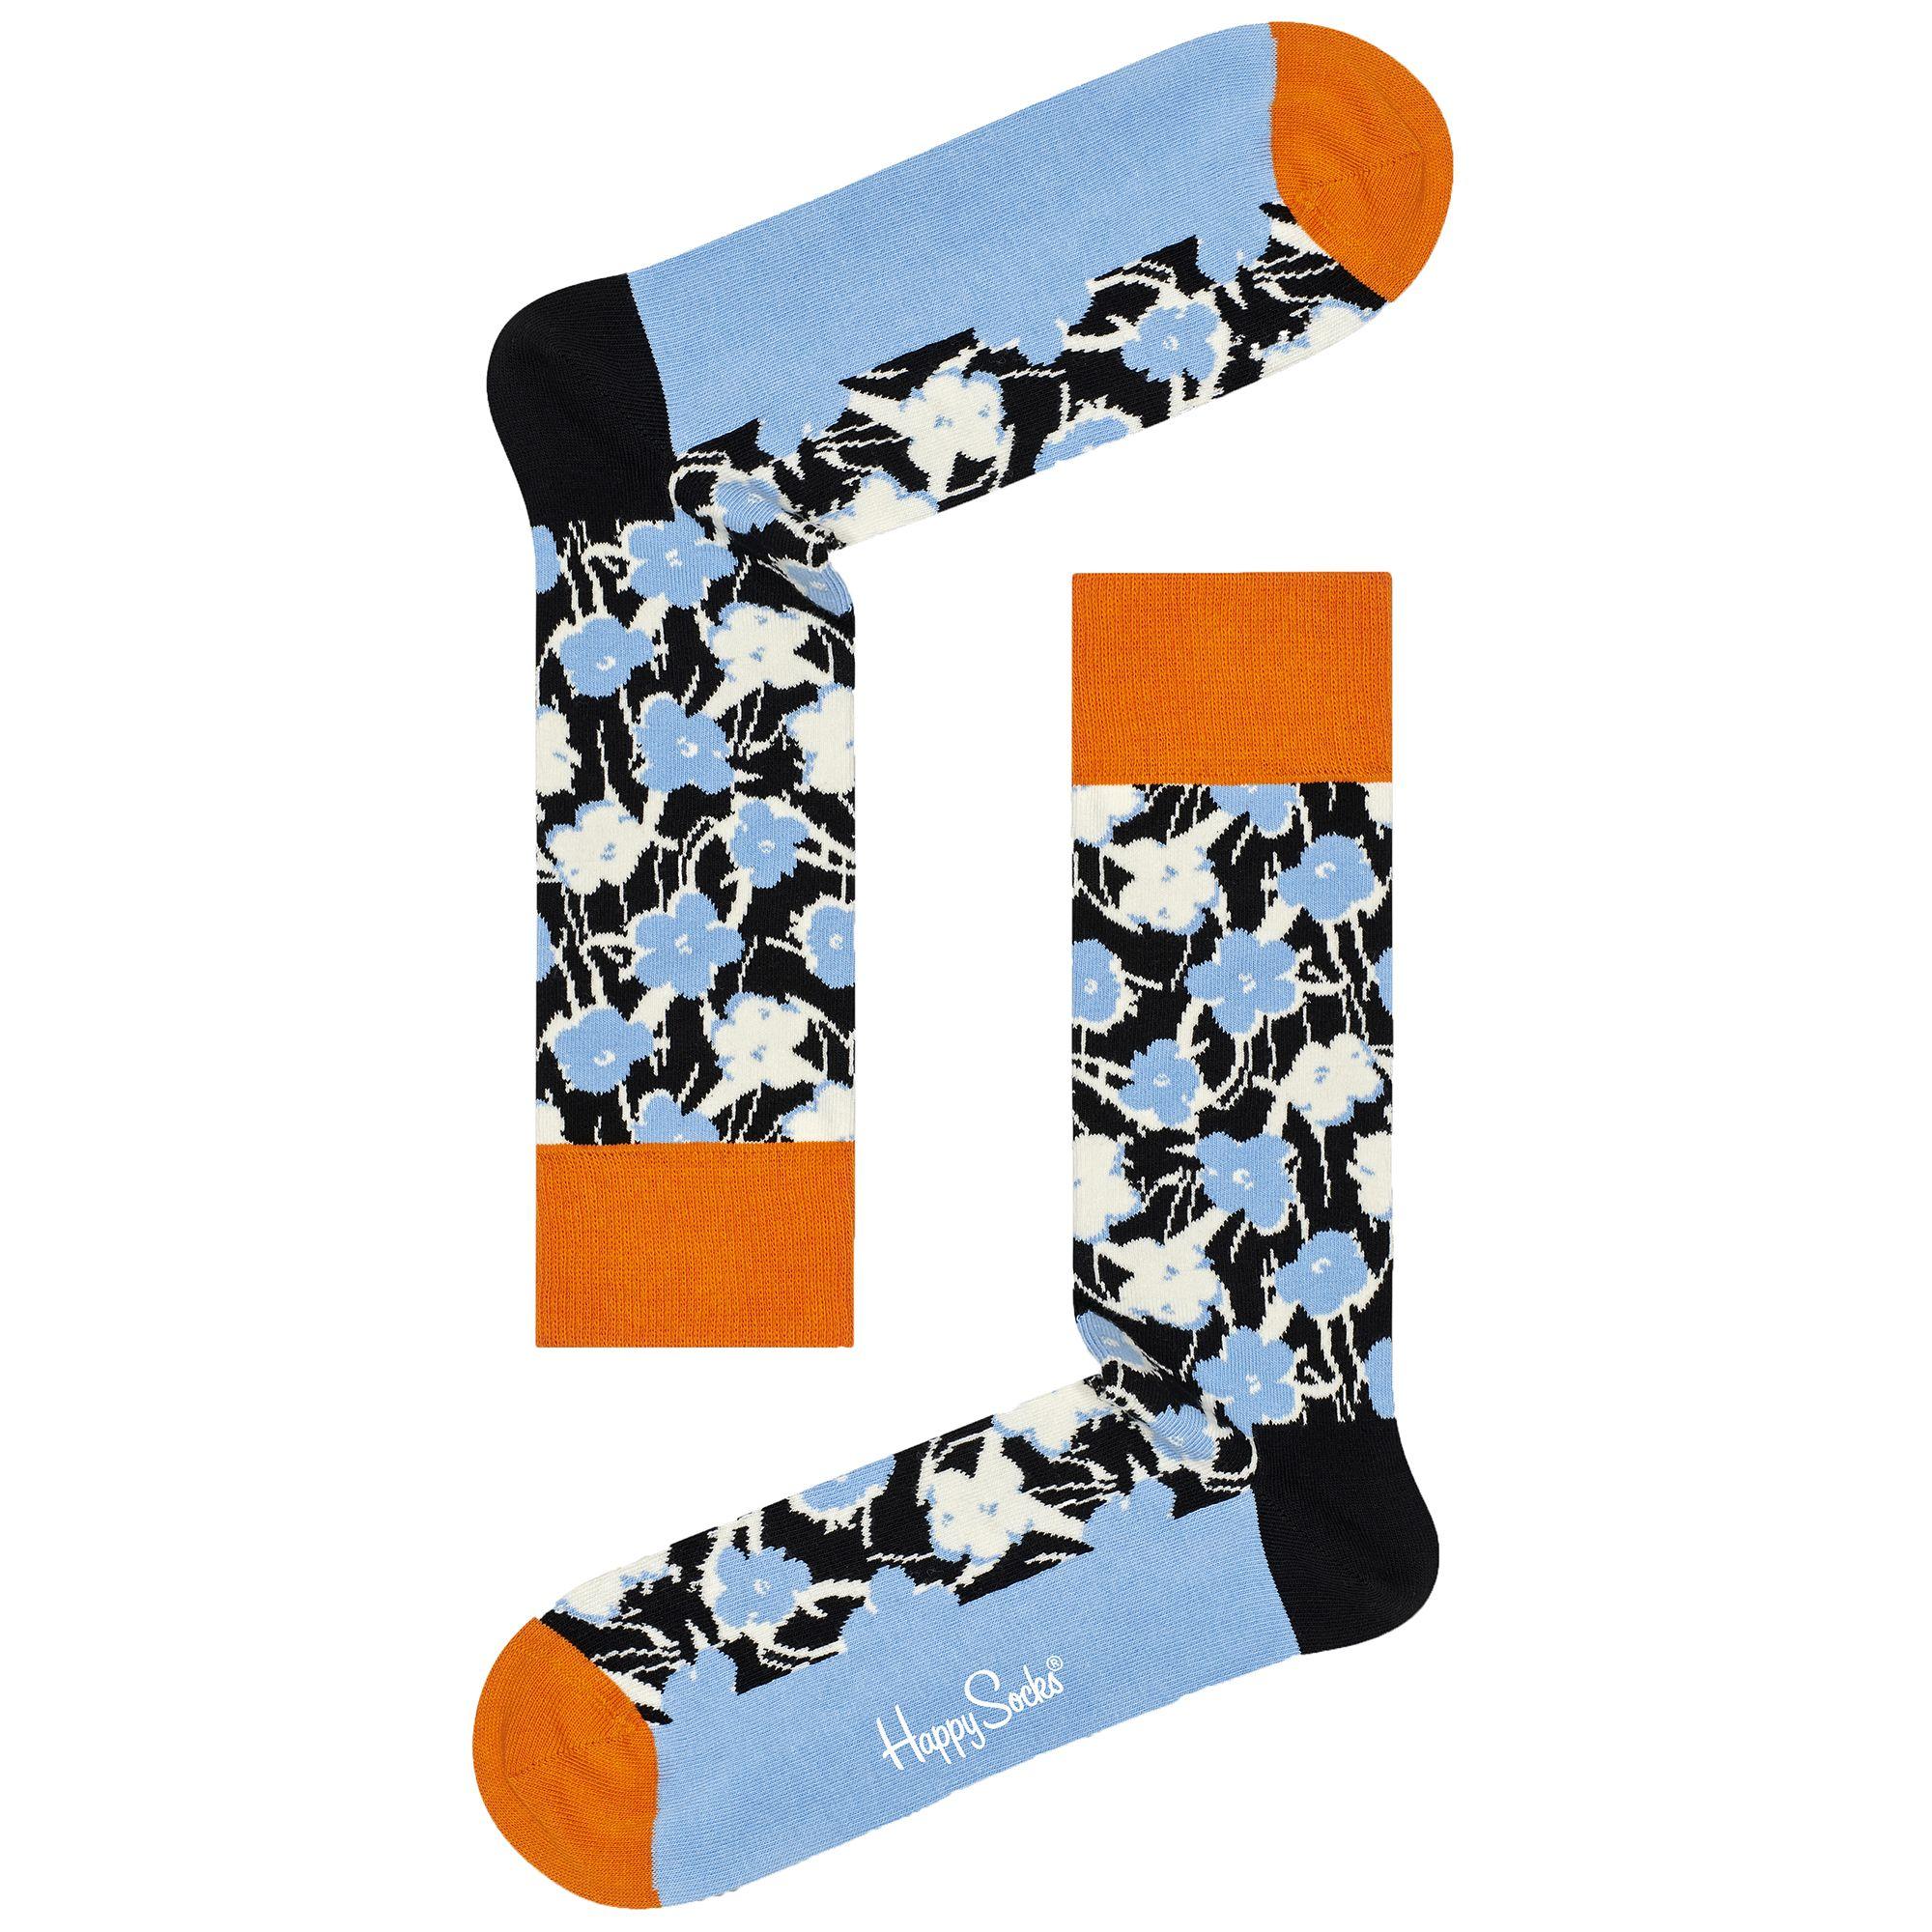 Happy Socks Andy Warhol Graphic Flower Socks - Blue - 41-46 #andywarhol